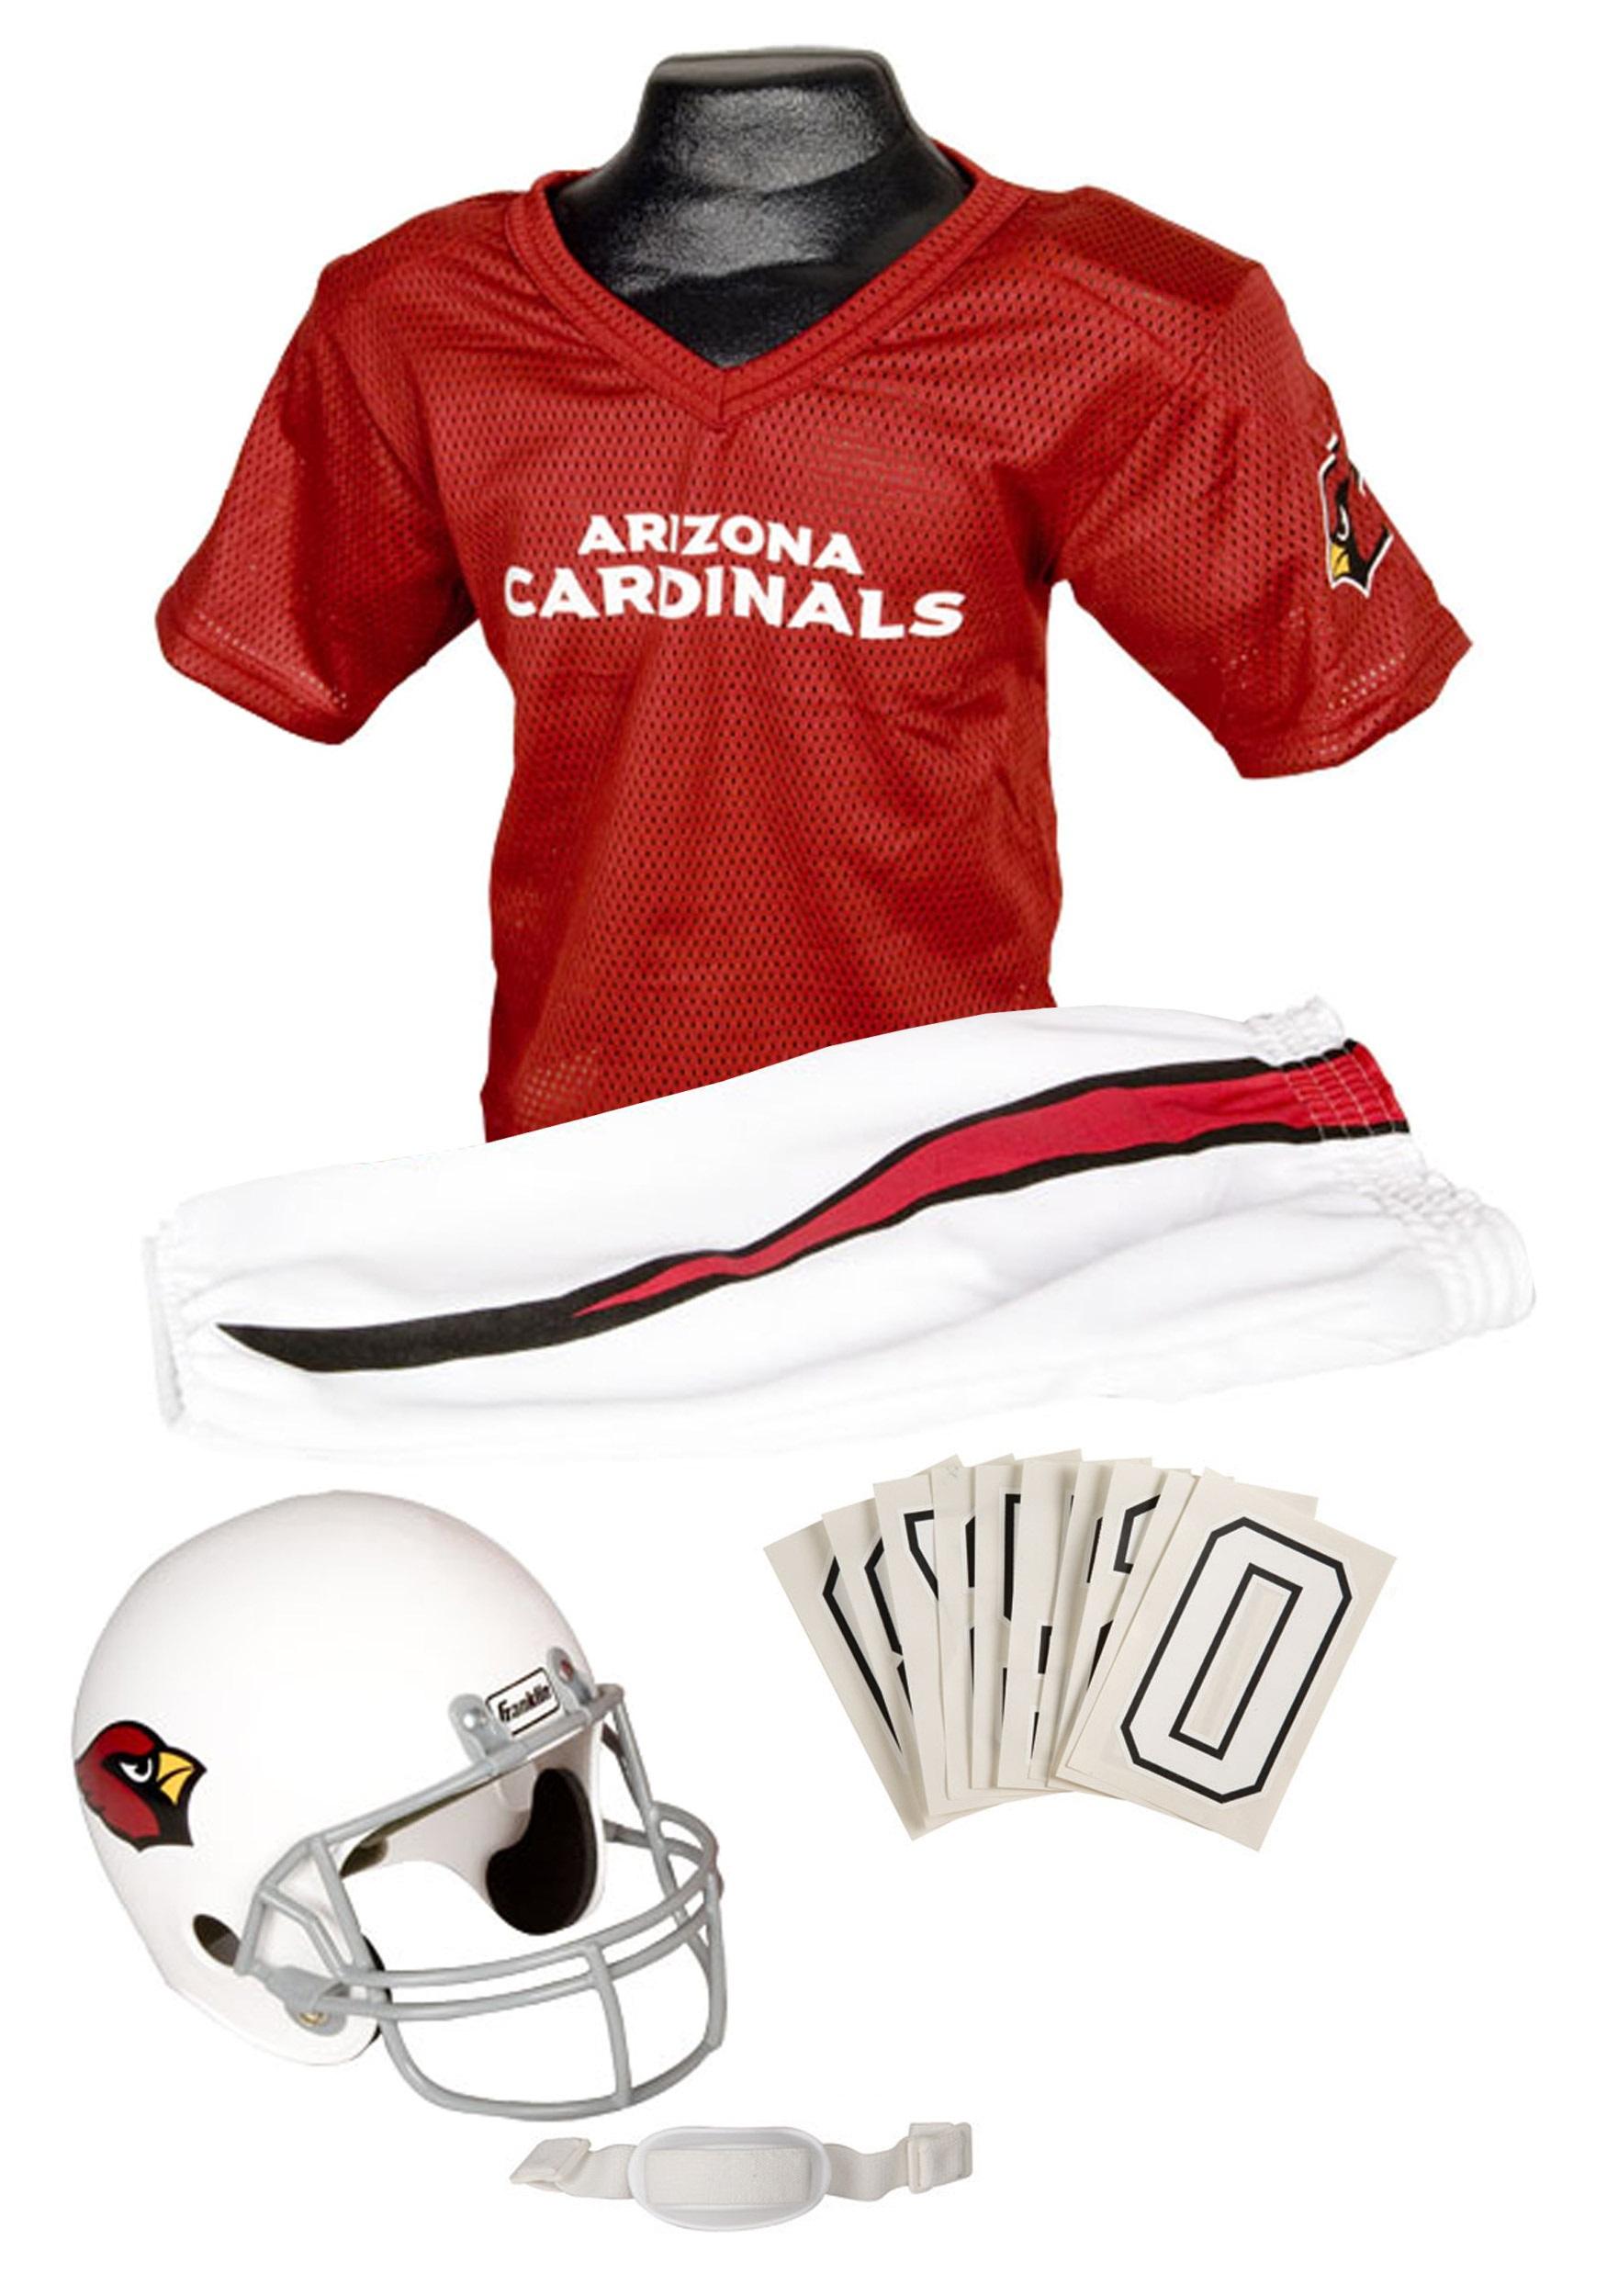 Kids NFL Cardinals Uniform Costume 615c86d87